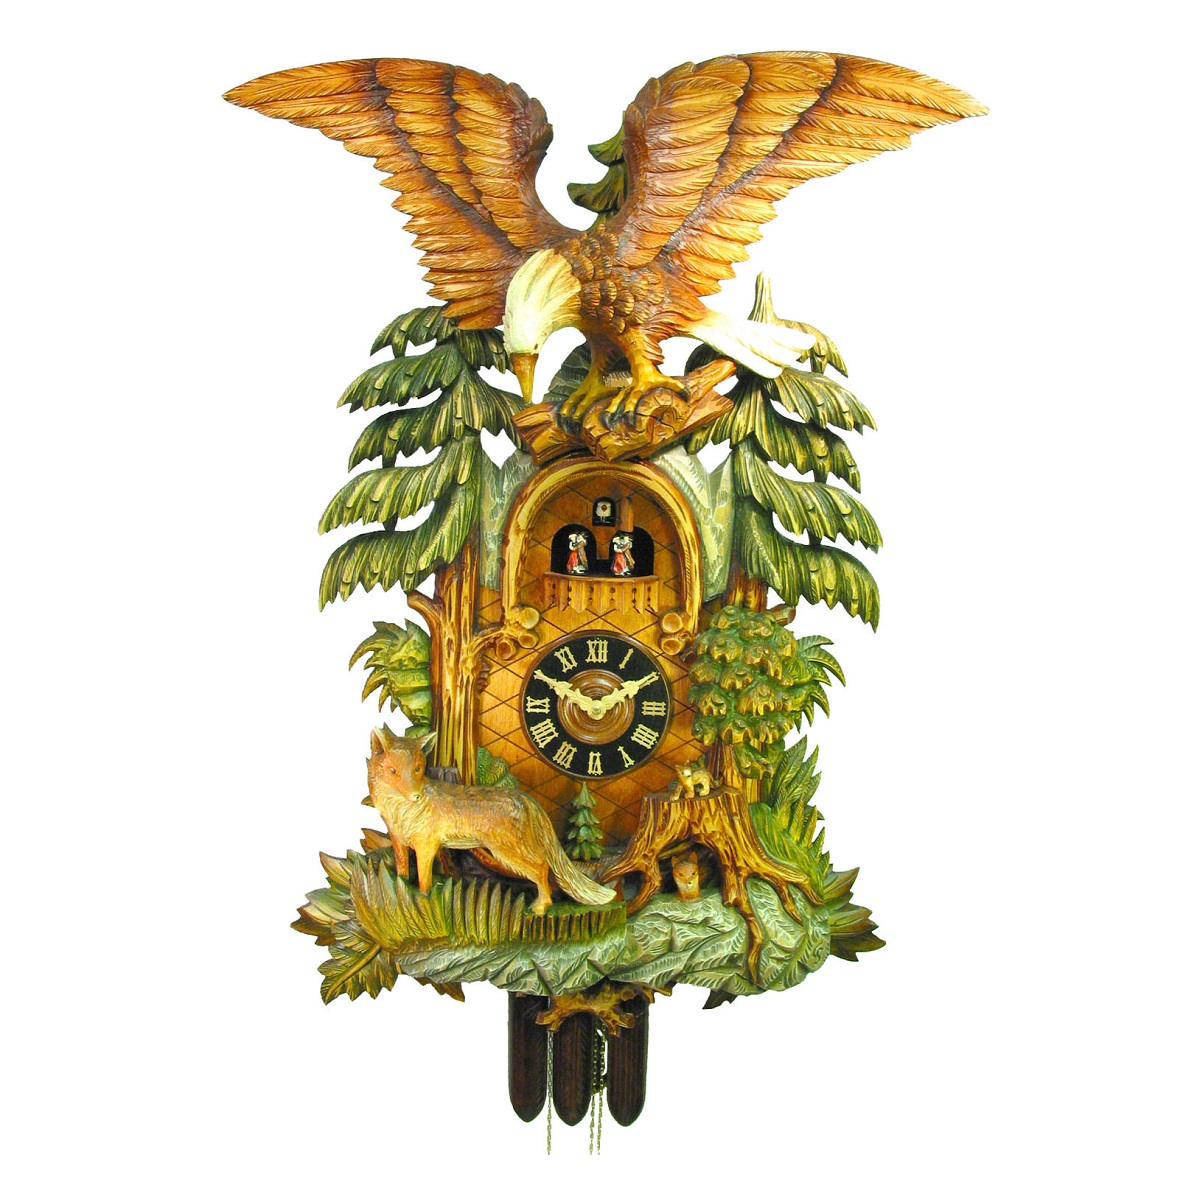 Đồng hồ treo tường cao cấp AUGUST SCHWER 036-50-19501P